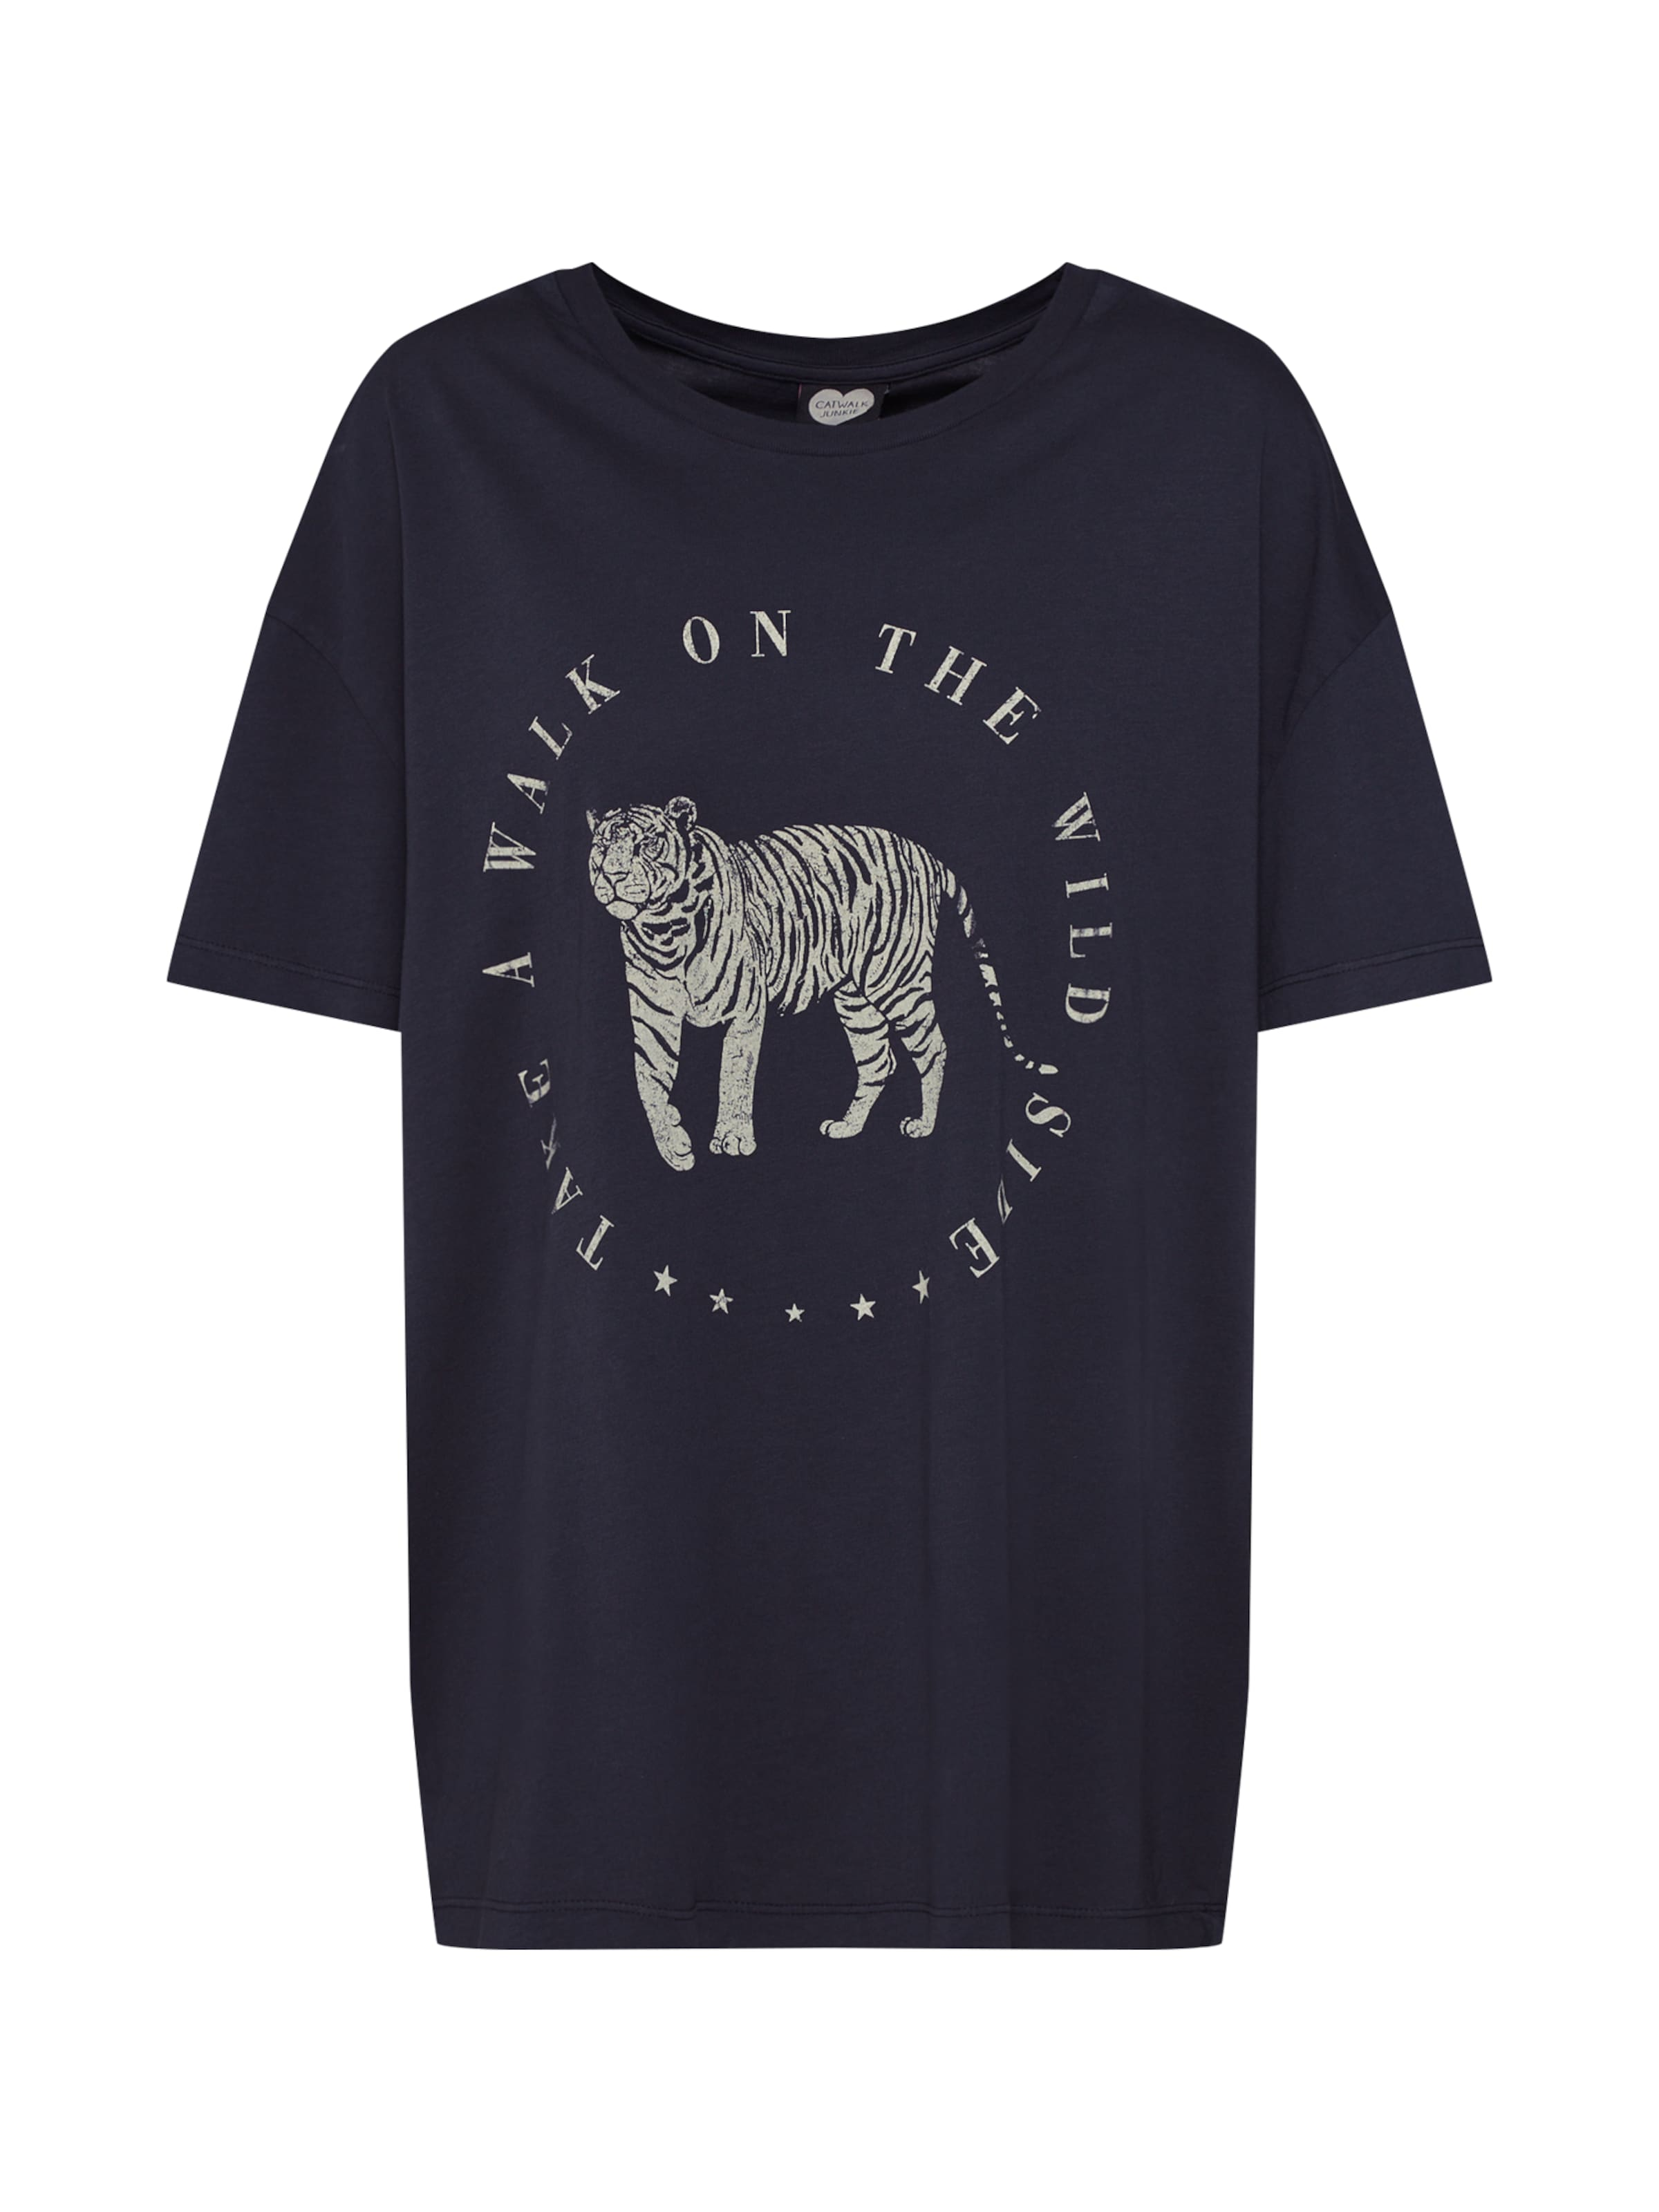 Junkie In Catwalk Shirt 'ts Bandit' Grau CxBhdostQr